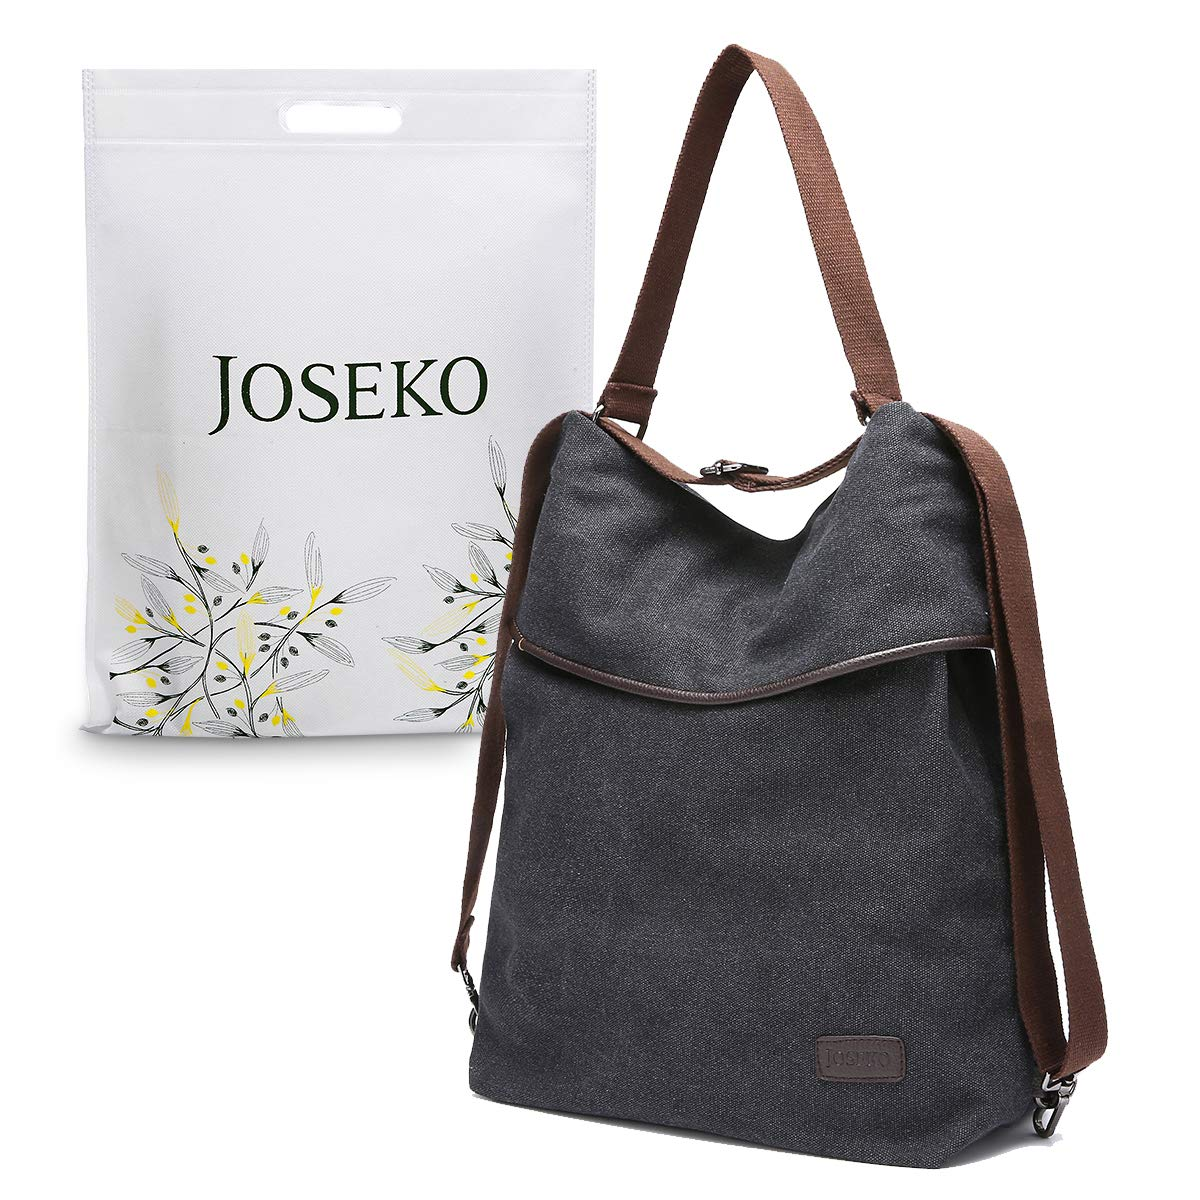 d94f072e30b Canvas Shoulder Bag Ladies Rucksack Vintage Handbags, JOSEKO Large Capacity  Backpack Bag Convertible Tote Multifunctional for Work Travel School ...